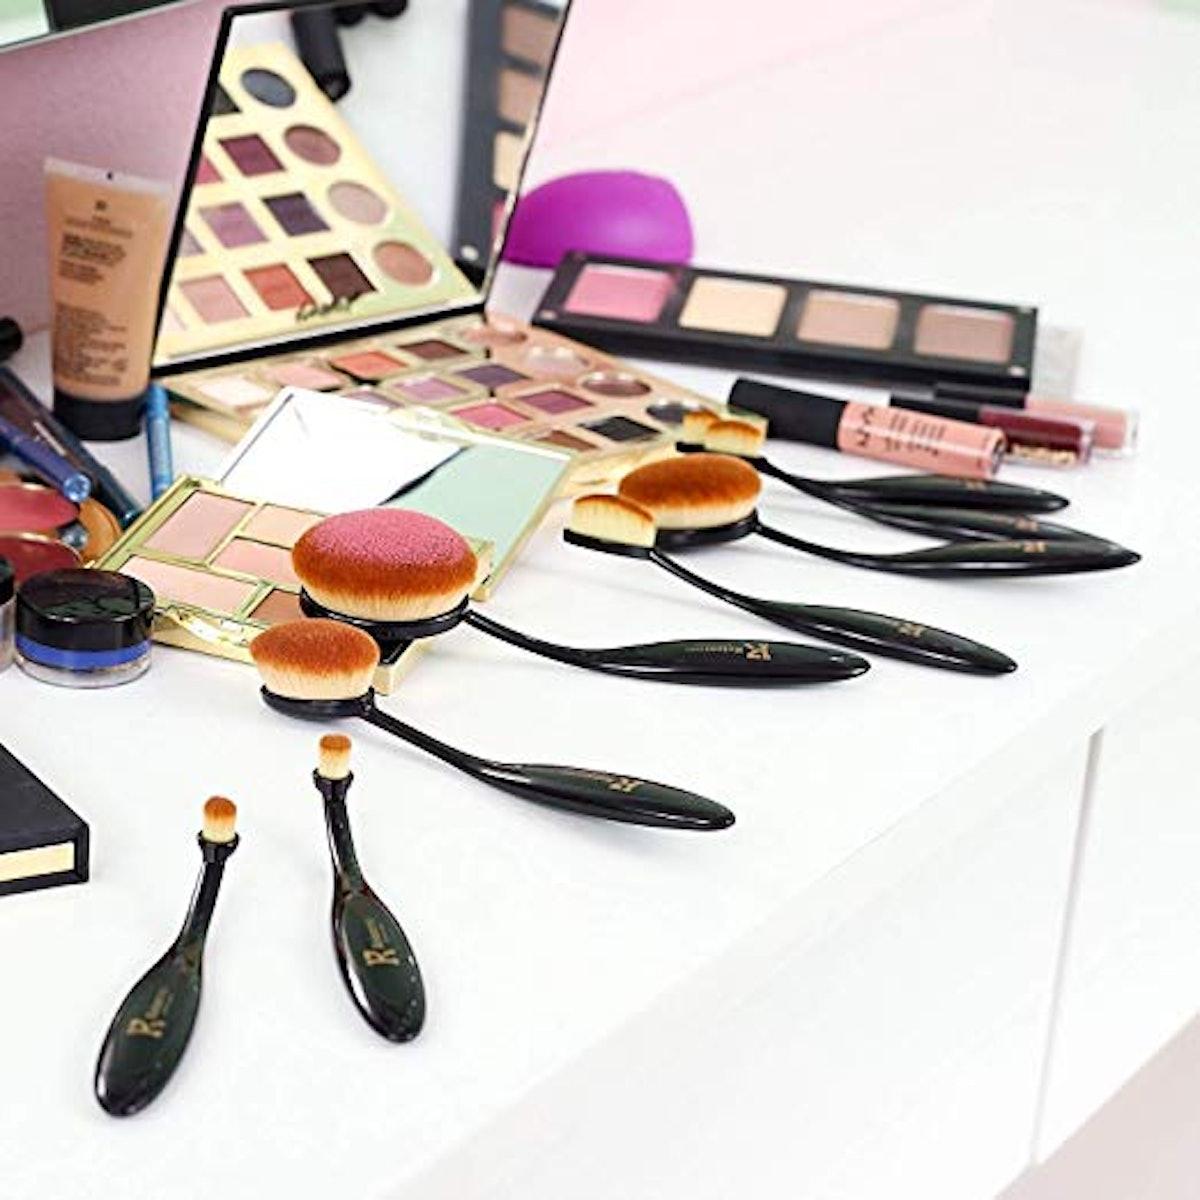 KeizerPro Premium Makeup Brush Set (10-Pack)